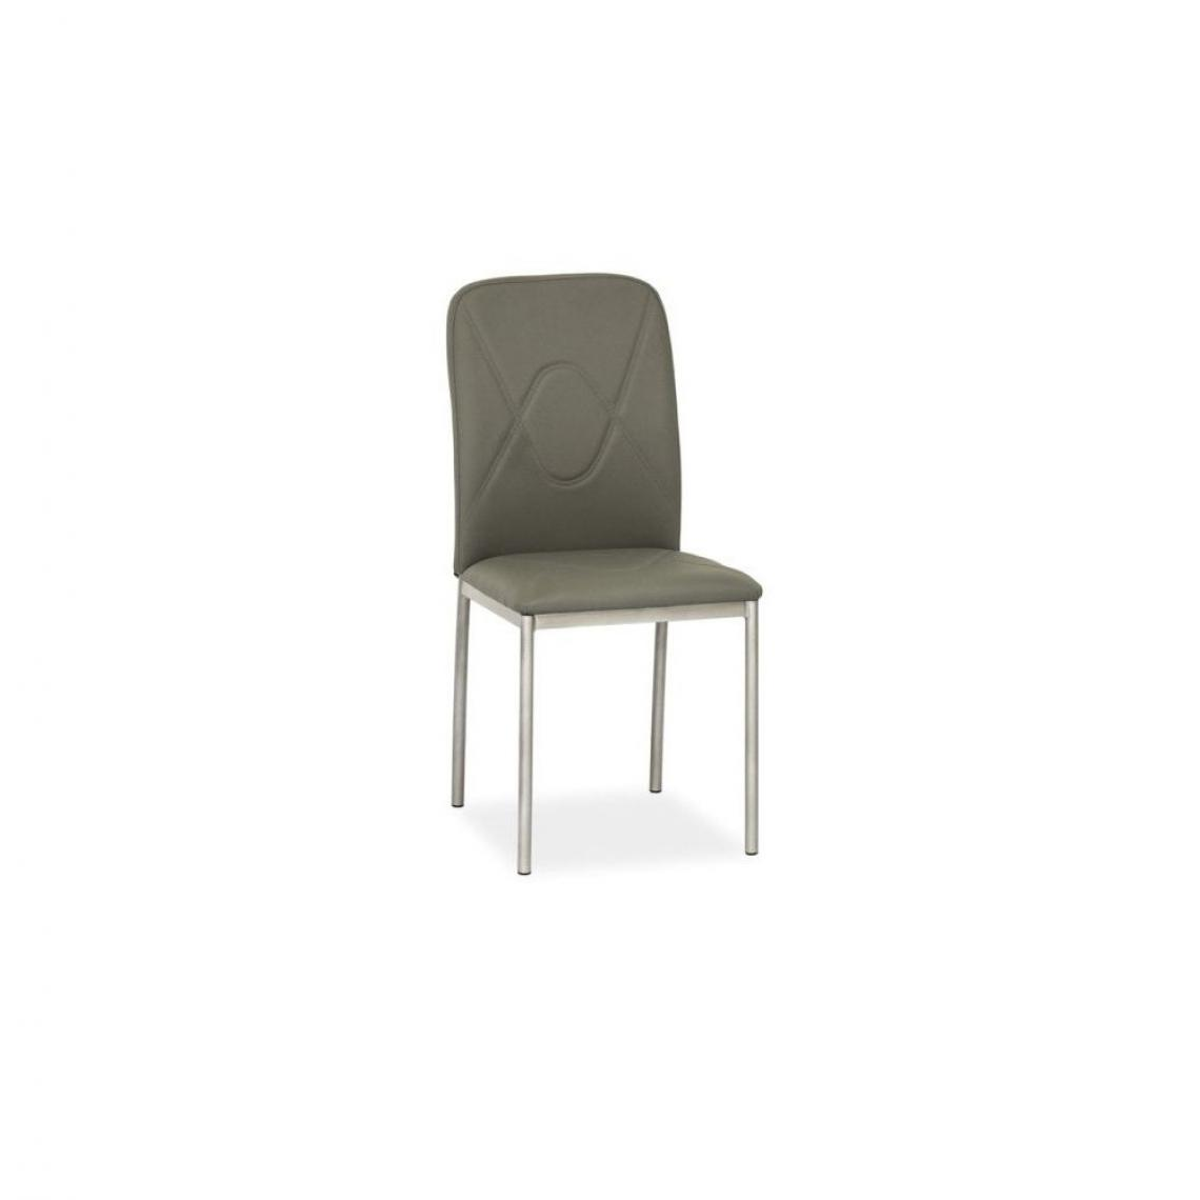 Ac-Deco Chaise moderne - H 623 - 42 x 41 x 90 cm - Gris